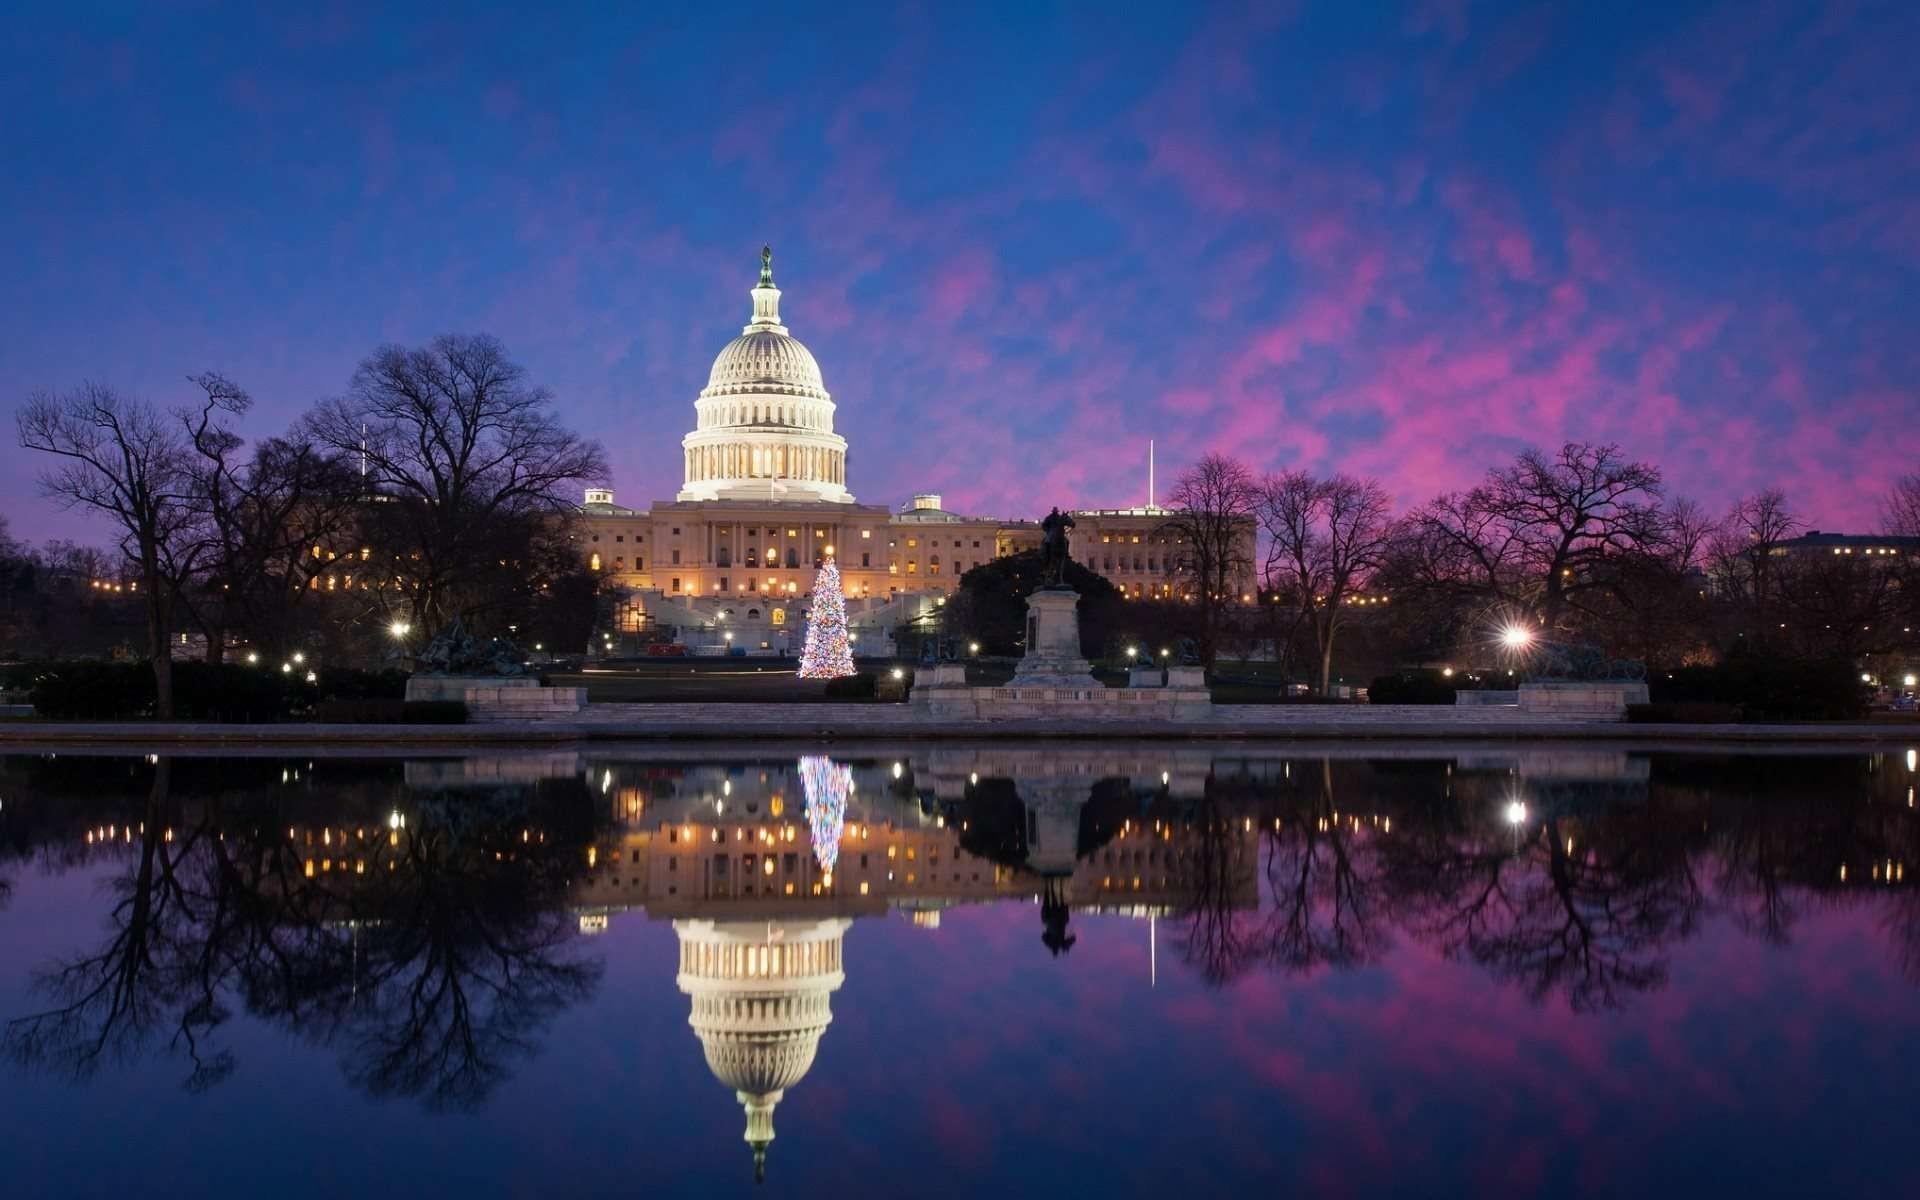 Washington DC Wallpaper | Washington DC Images | Cool Wallpapers